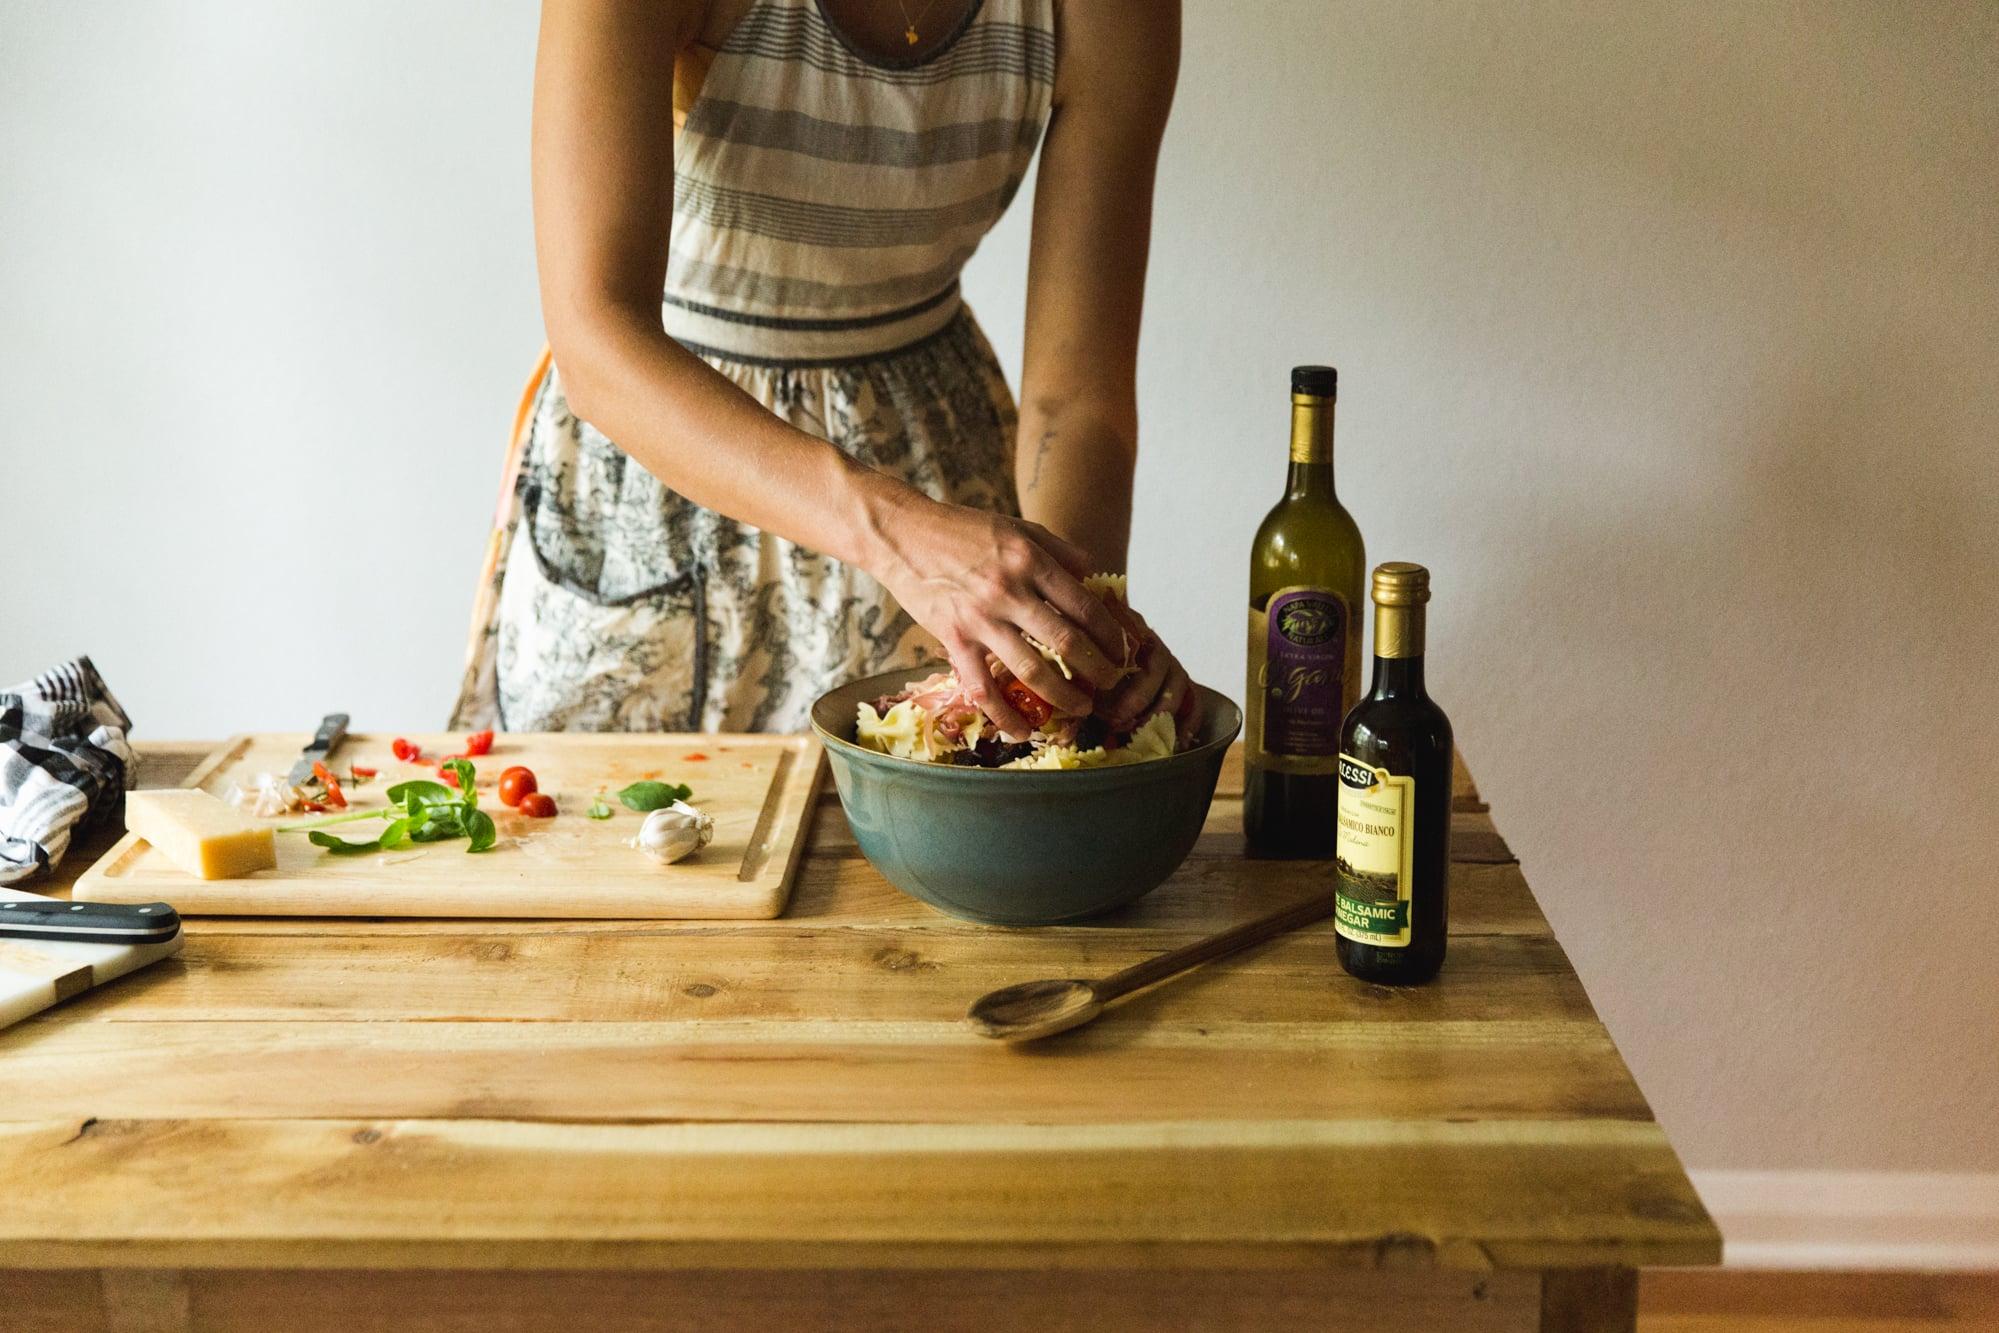 fig-prosciutto-pasta-salad-recipe-16.jpg